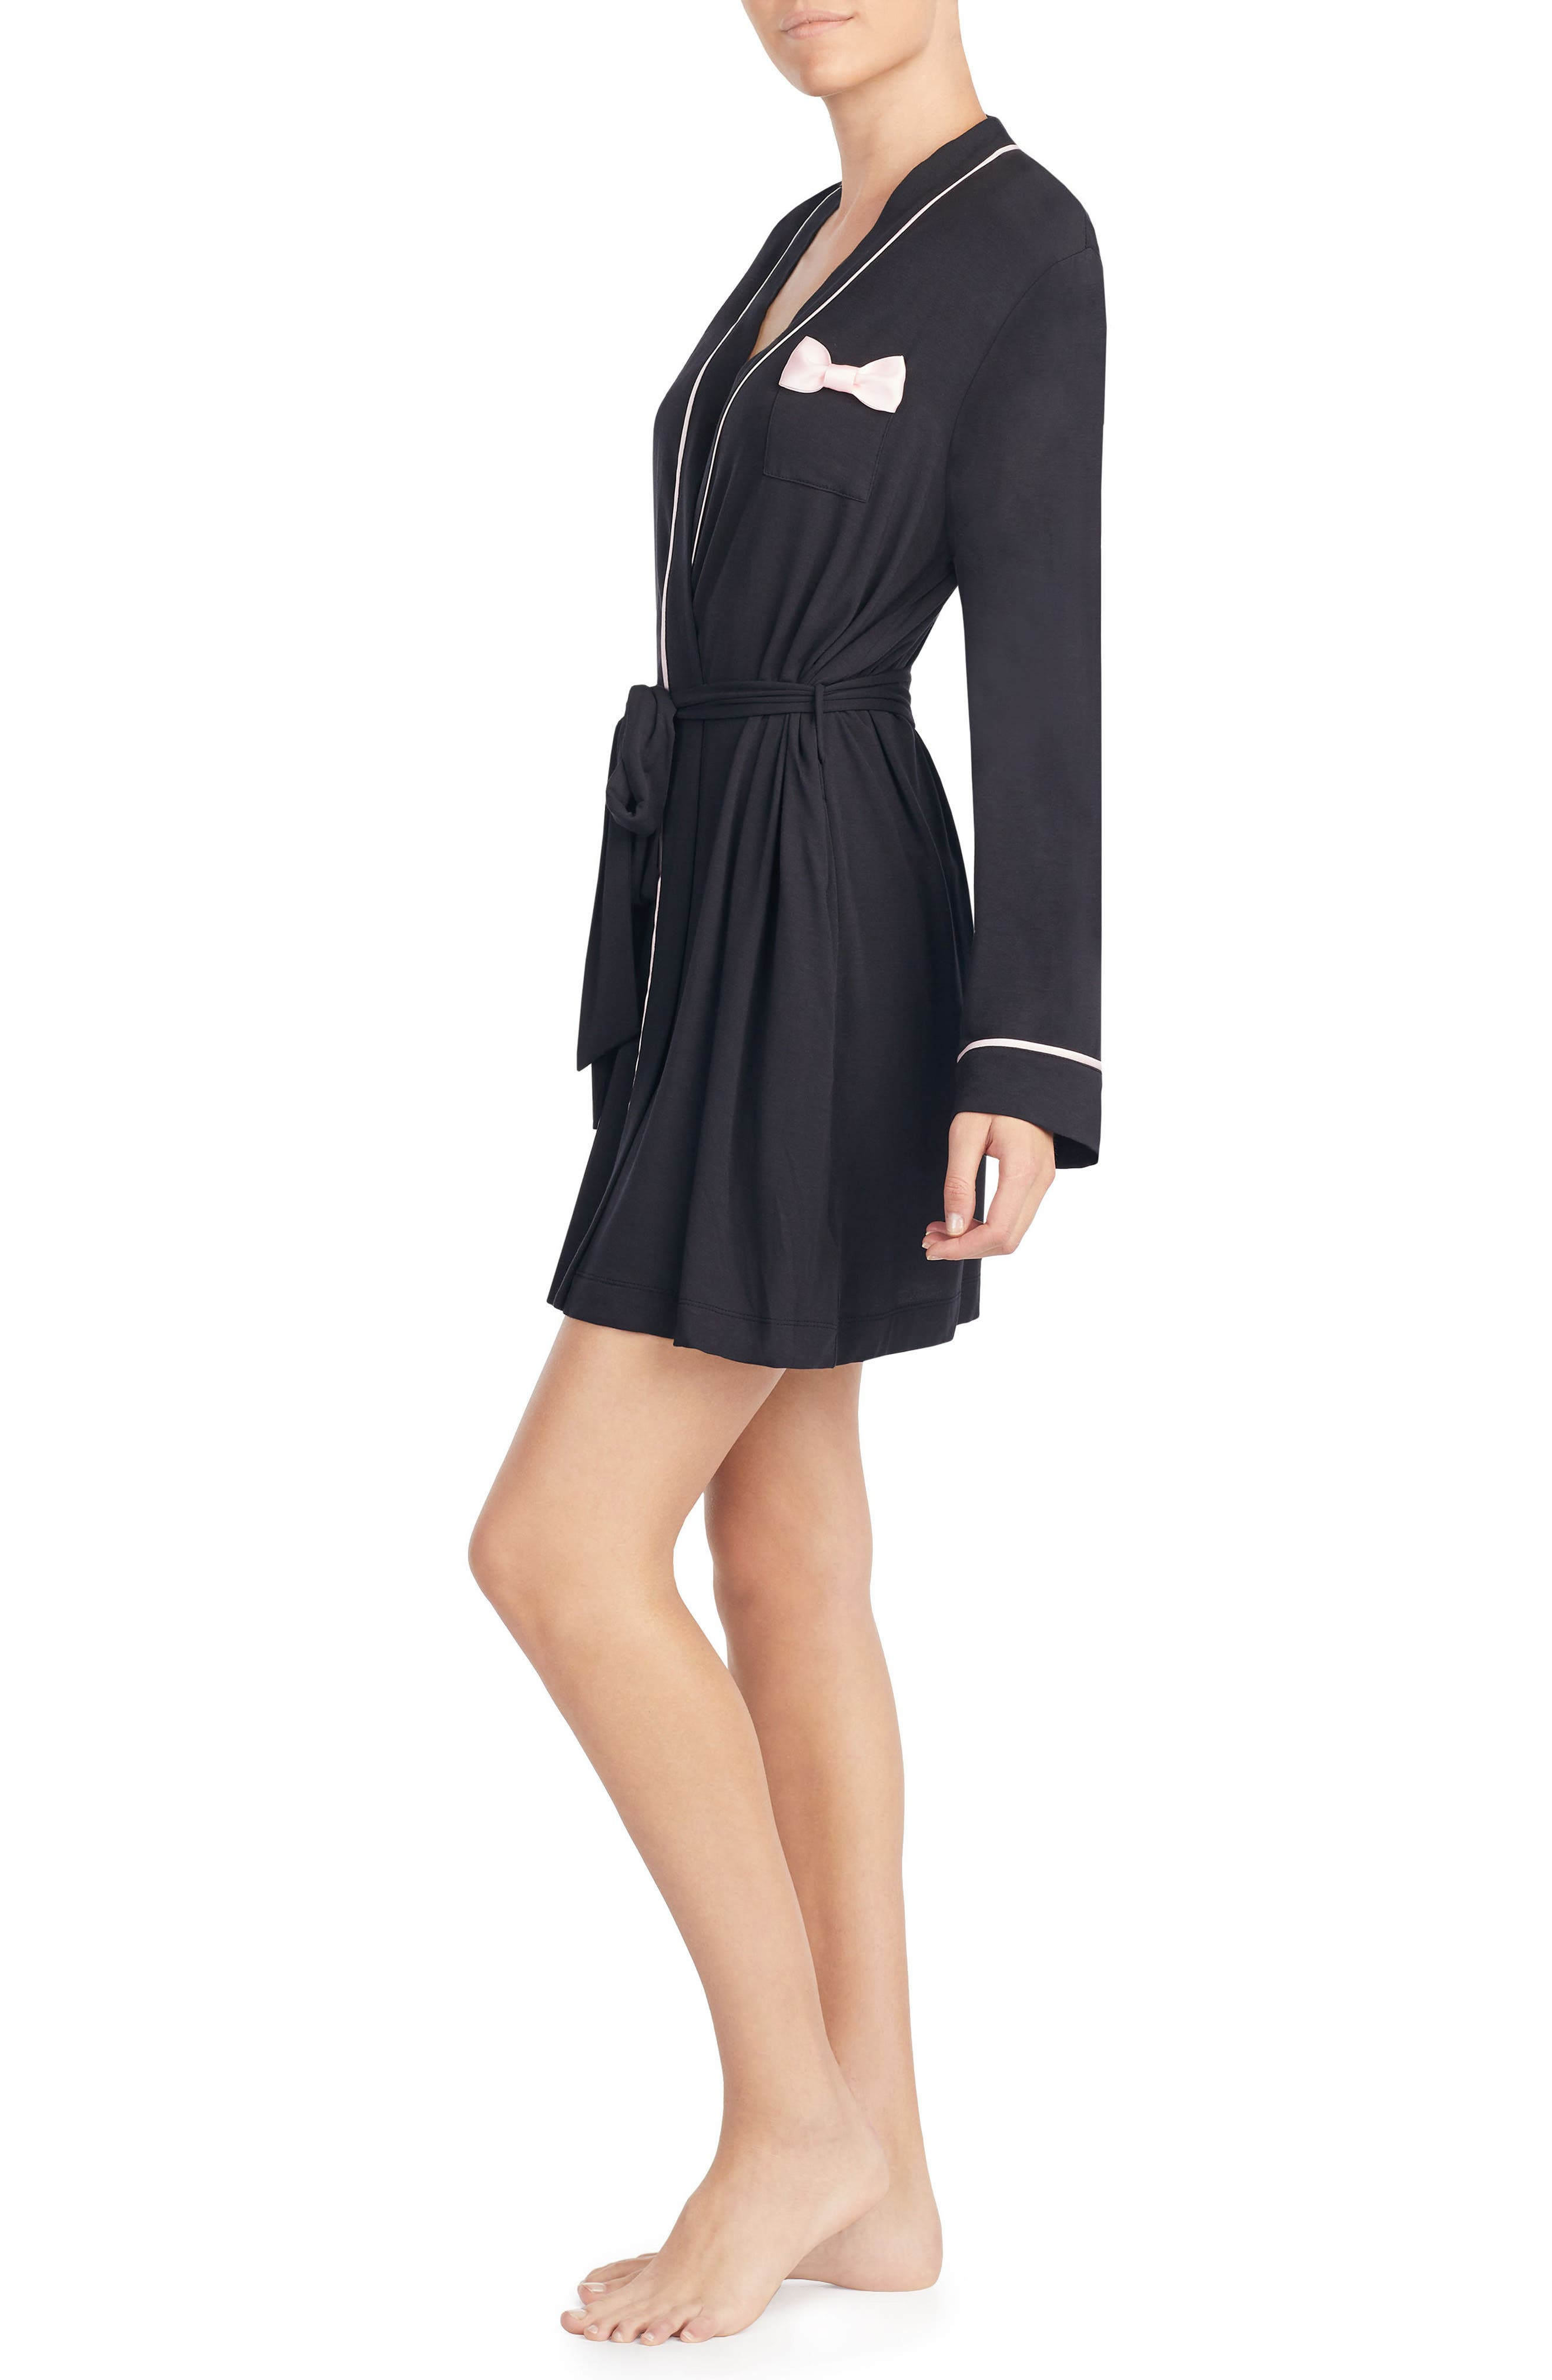 KATE SPADE NEW YORK, jersey short robe, Alternate thumbnail 3, color, BLACK